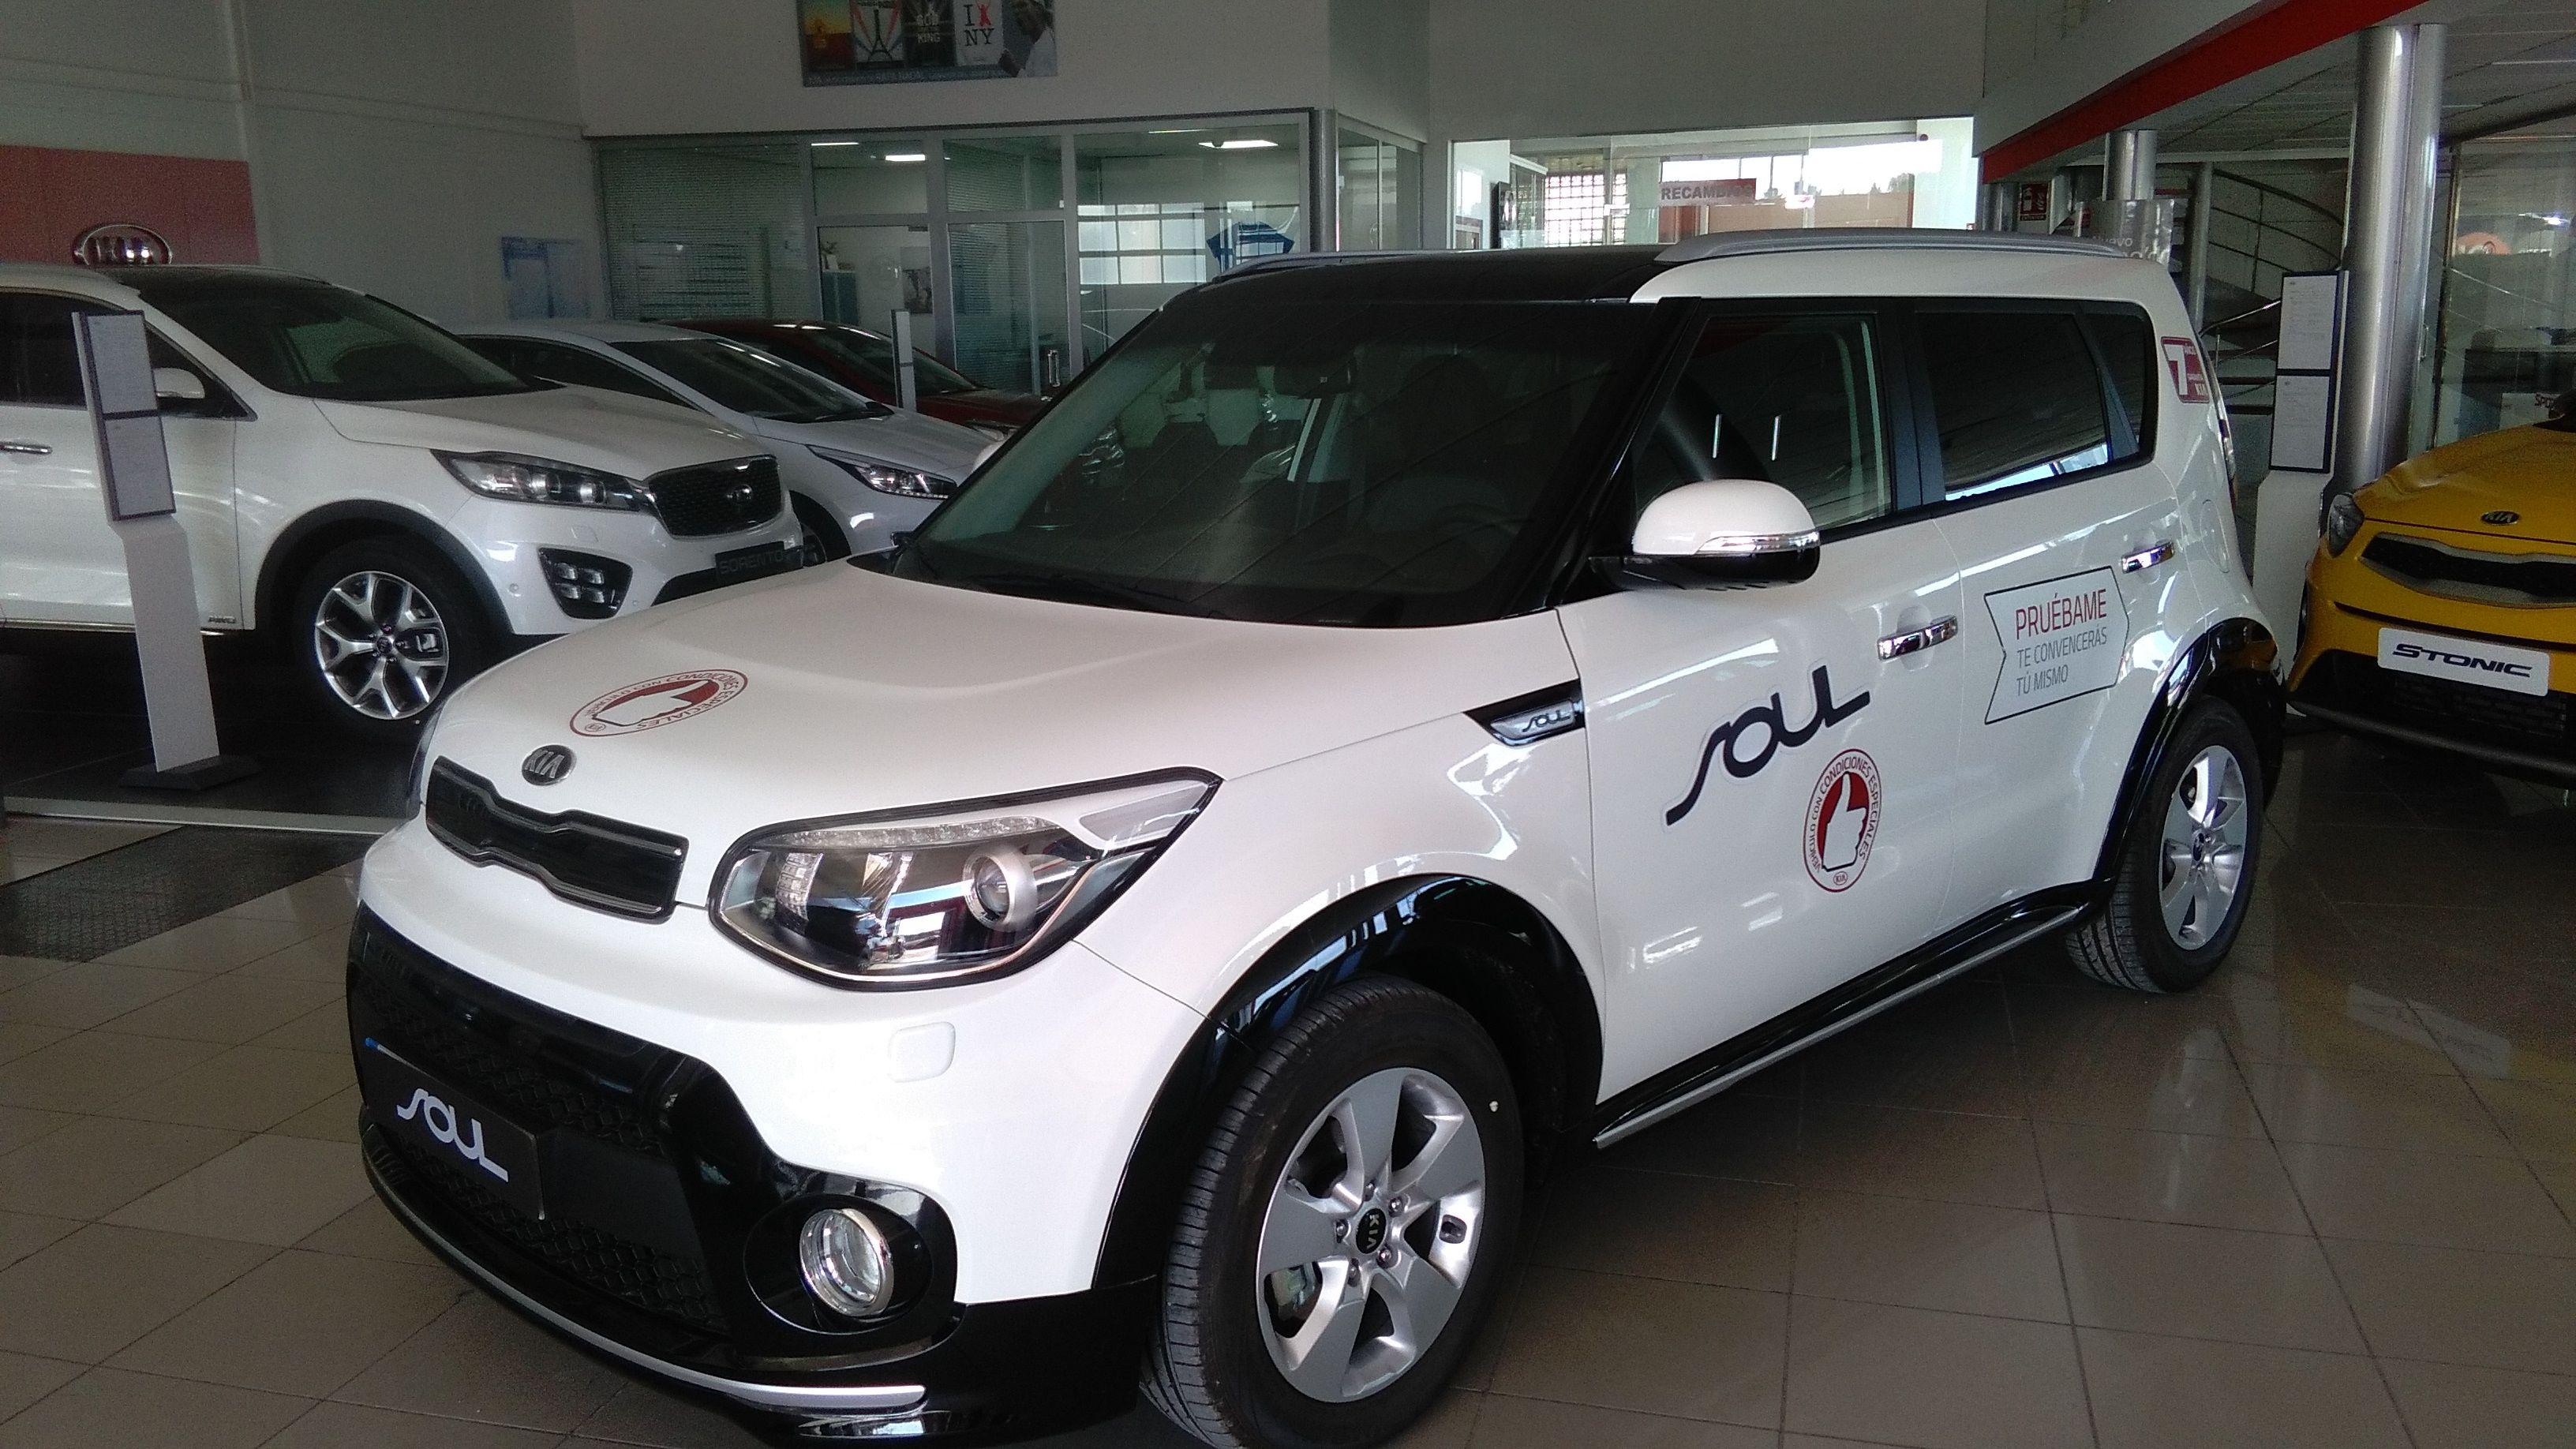 KIA SOUL 1.6 CRDI DRIVE 136CV.  (PACK SUV Y PACK VISION)